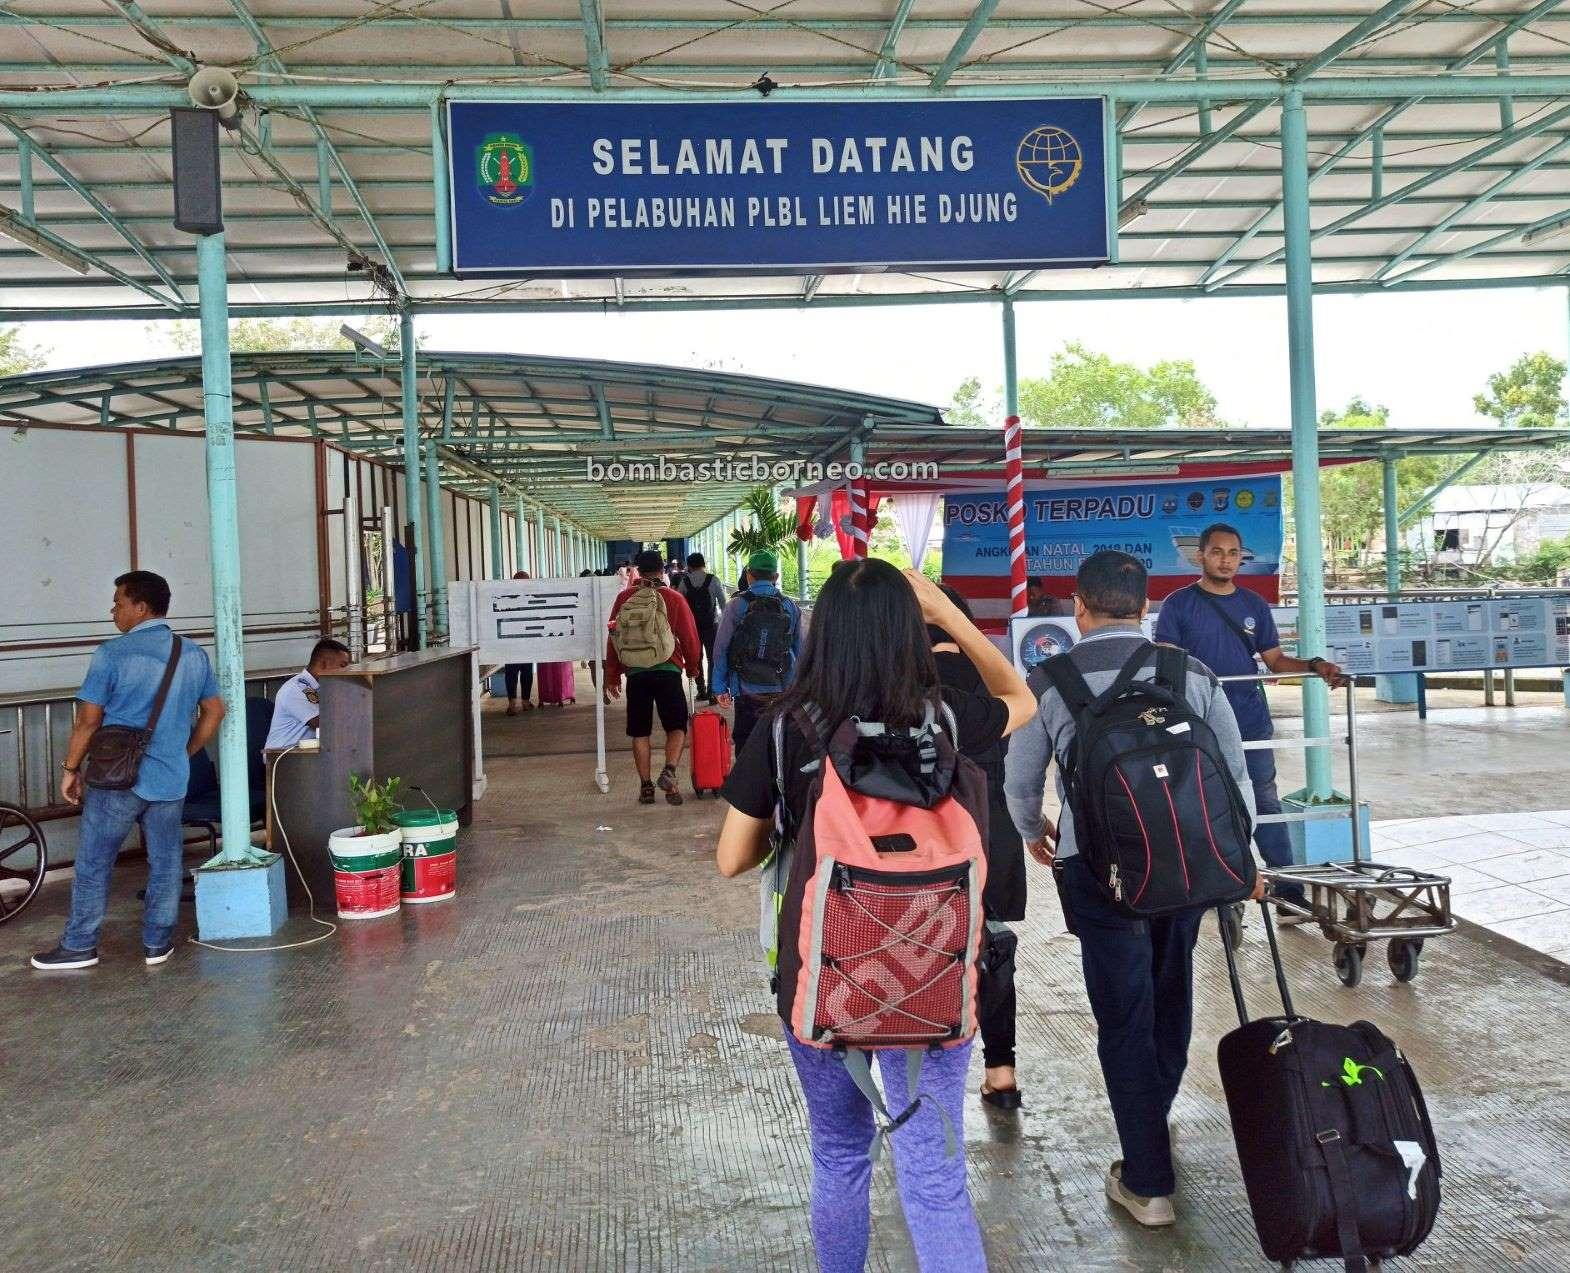 ferry terminal, express boat, speedboat ride, Kapal Besar, international, backpackers, exploration, destination, Indonesia, obyek wisata, Tourism, travel guide, cross border, 跨境婆罗洲游踪, 印尼北加里曼丹